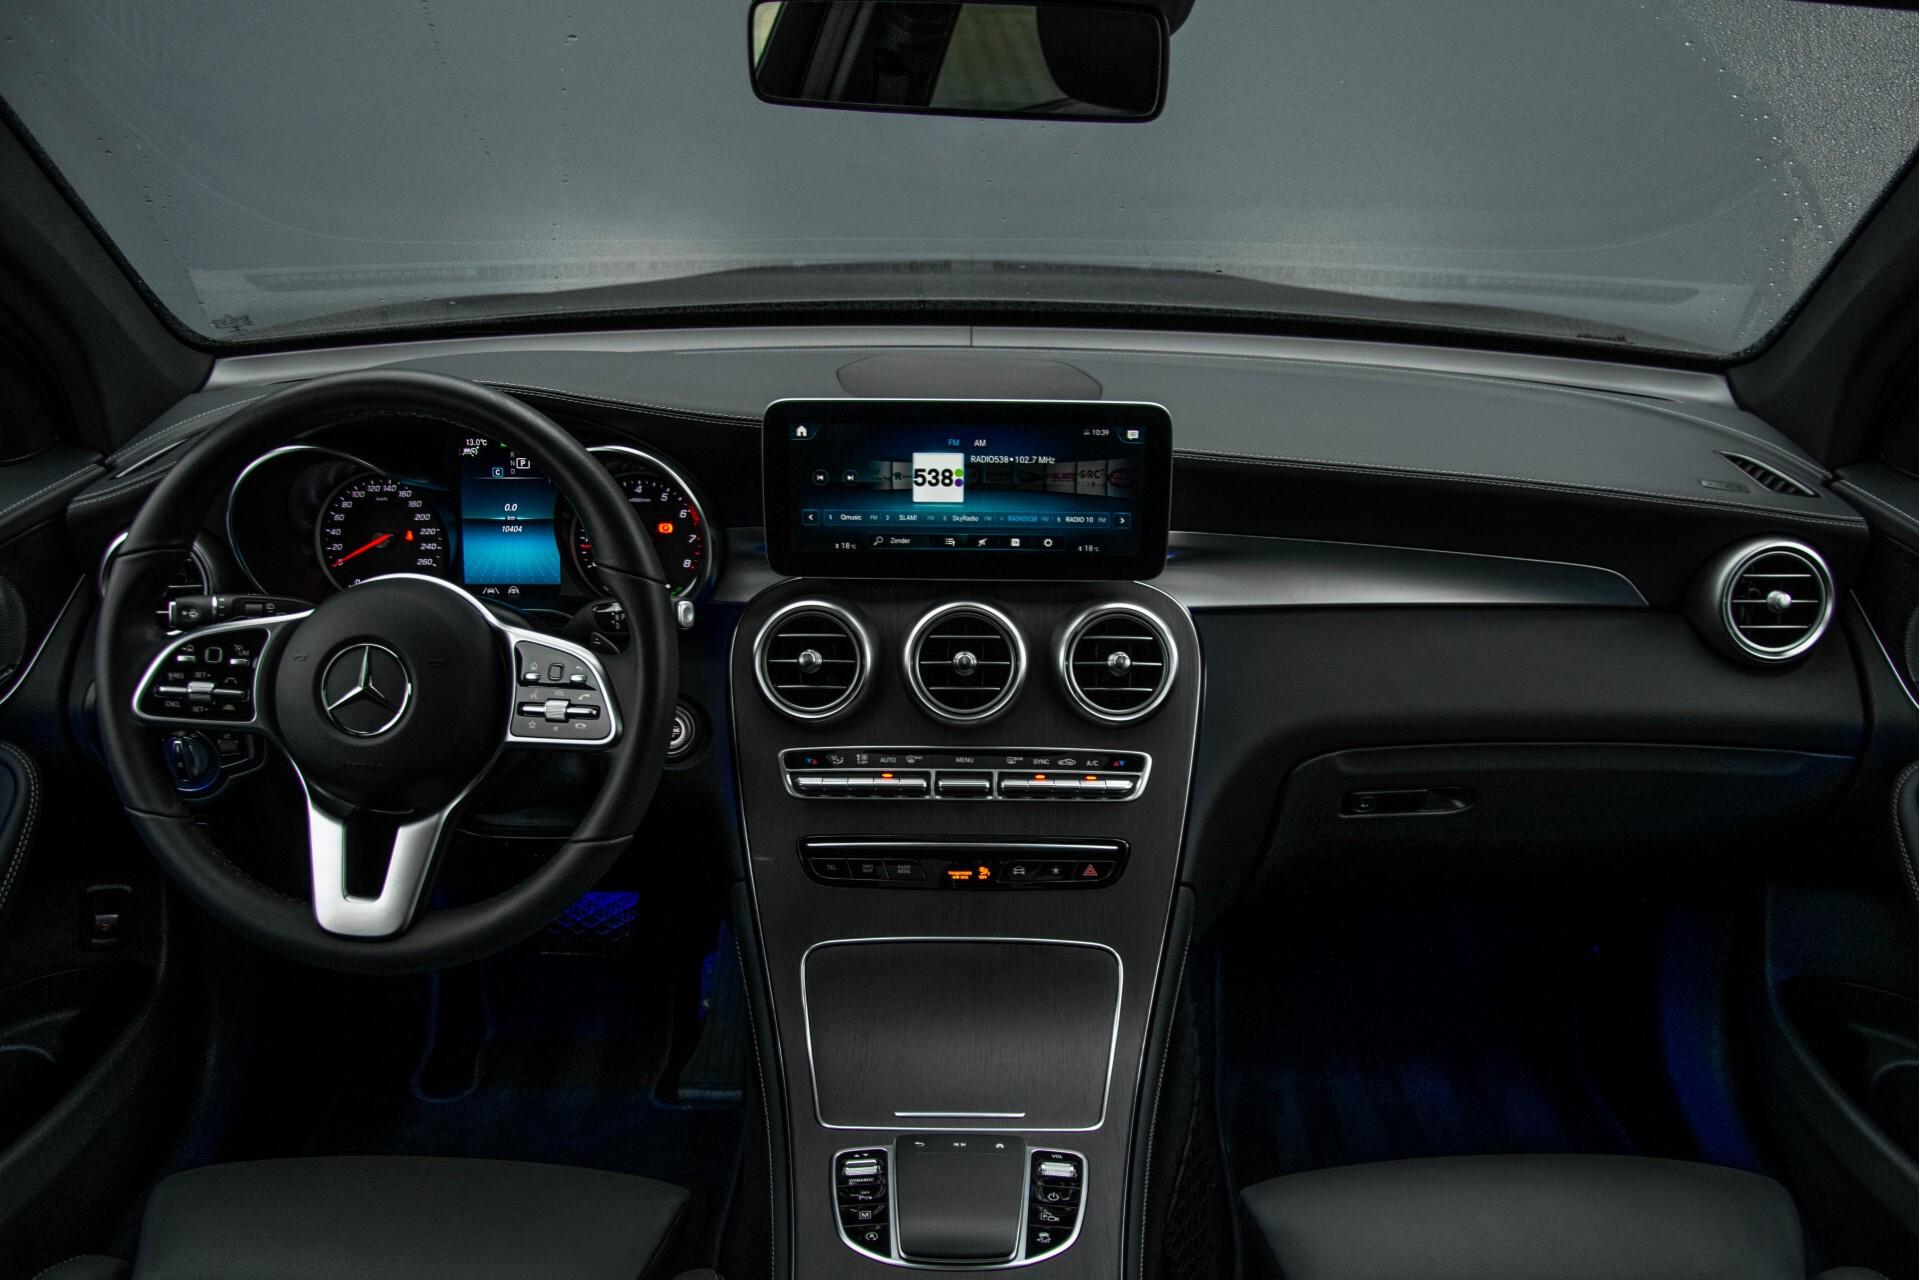 Mercedes-Benz GLC 200 4-M AMG Night/Panorama/Distronic Pro/Burmester/360camera/Exclusive Aut9 Foto 8